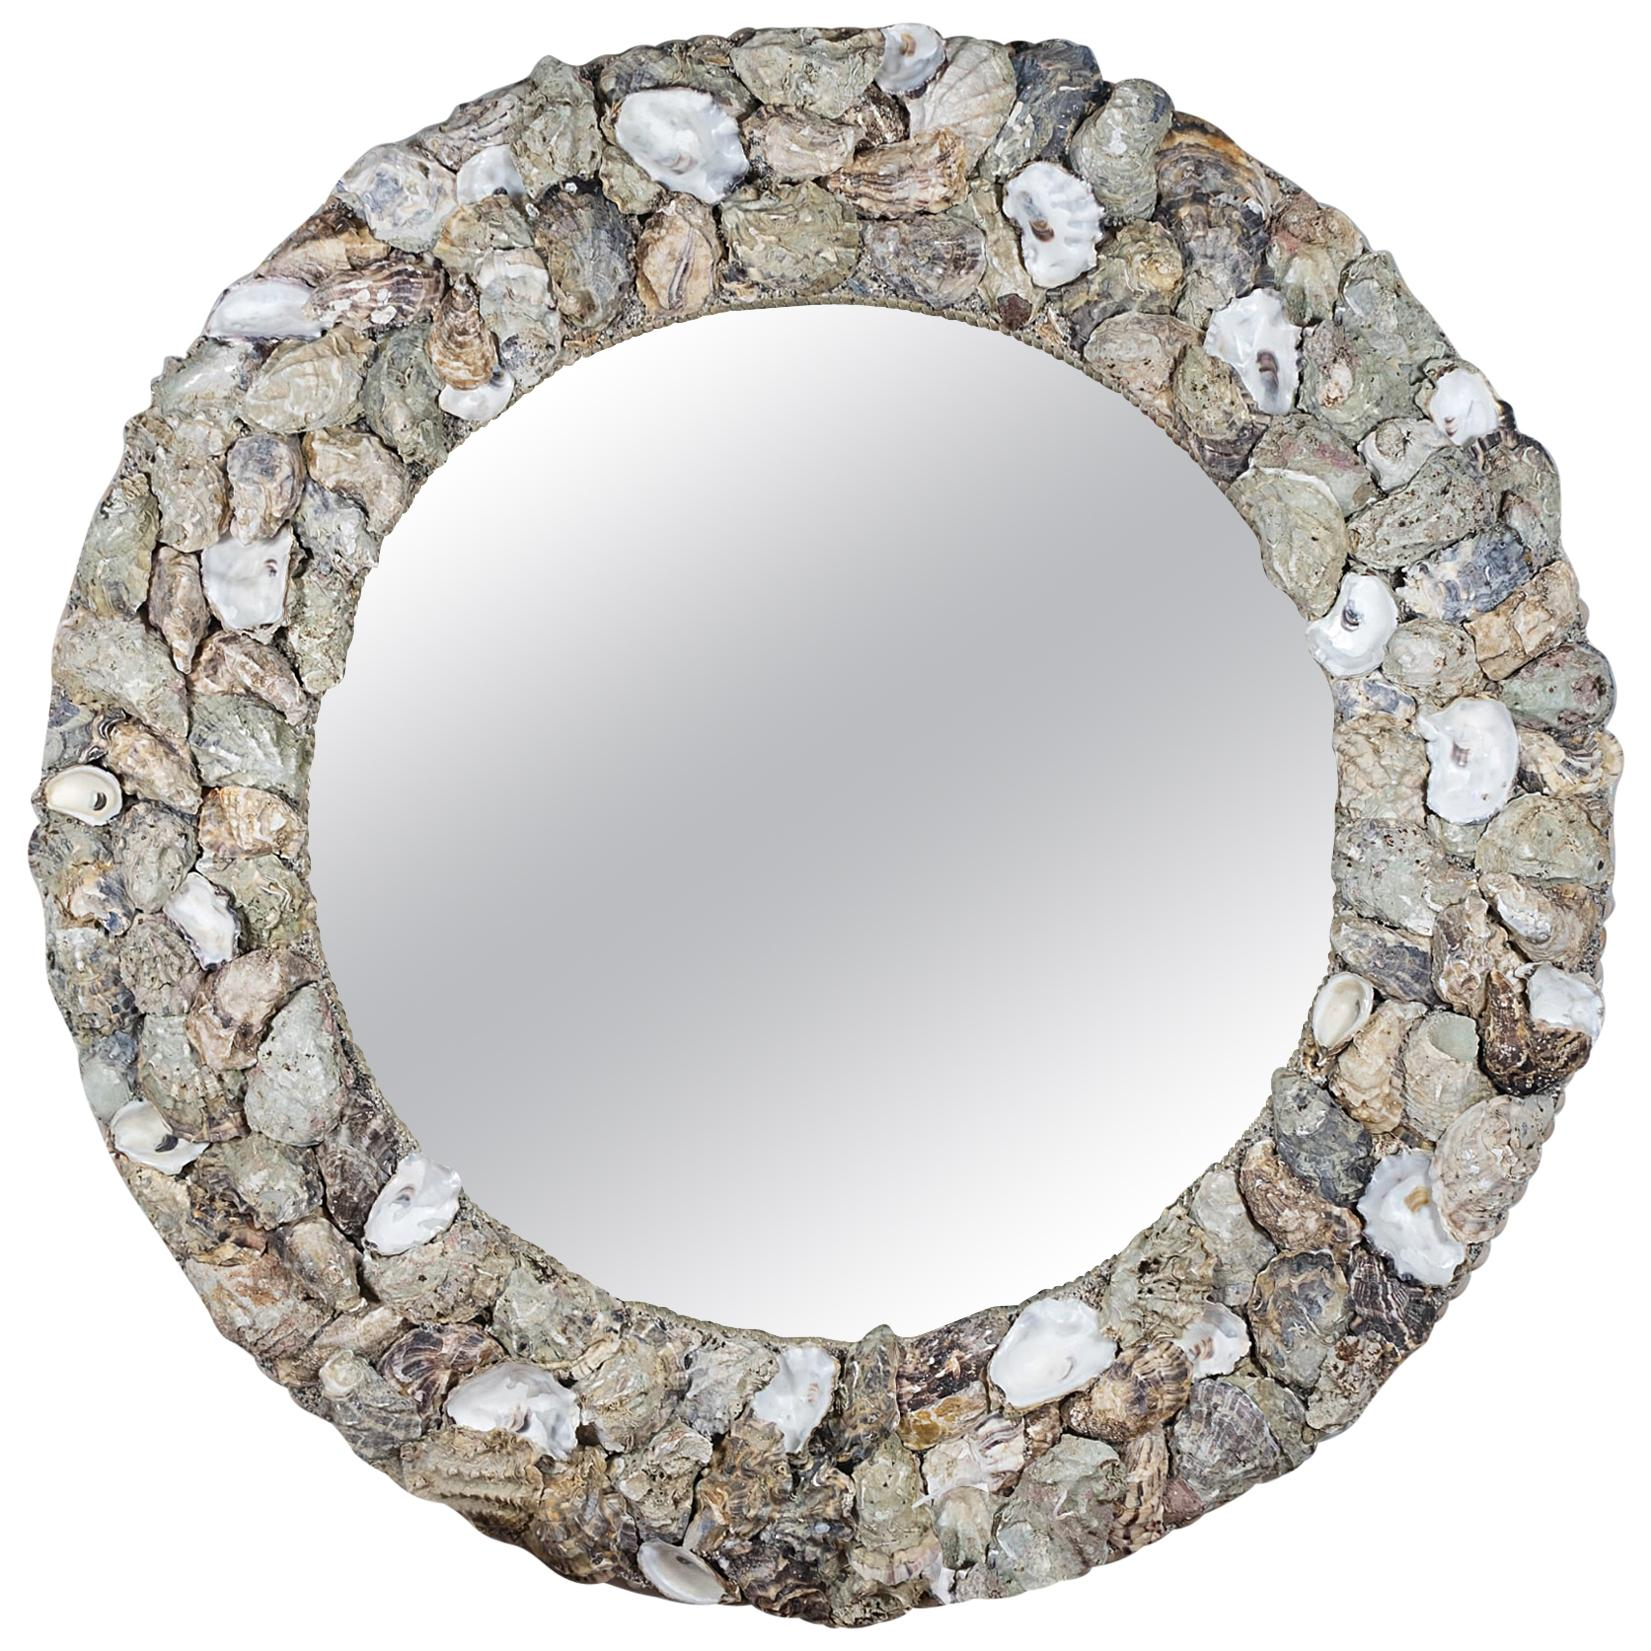 Oyster Bonanza, Unique Shell Mirror by Shellman Scandinavia, Sweden